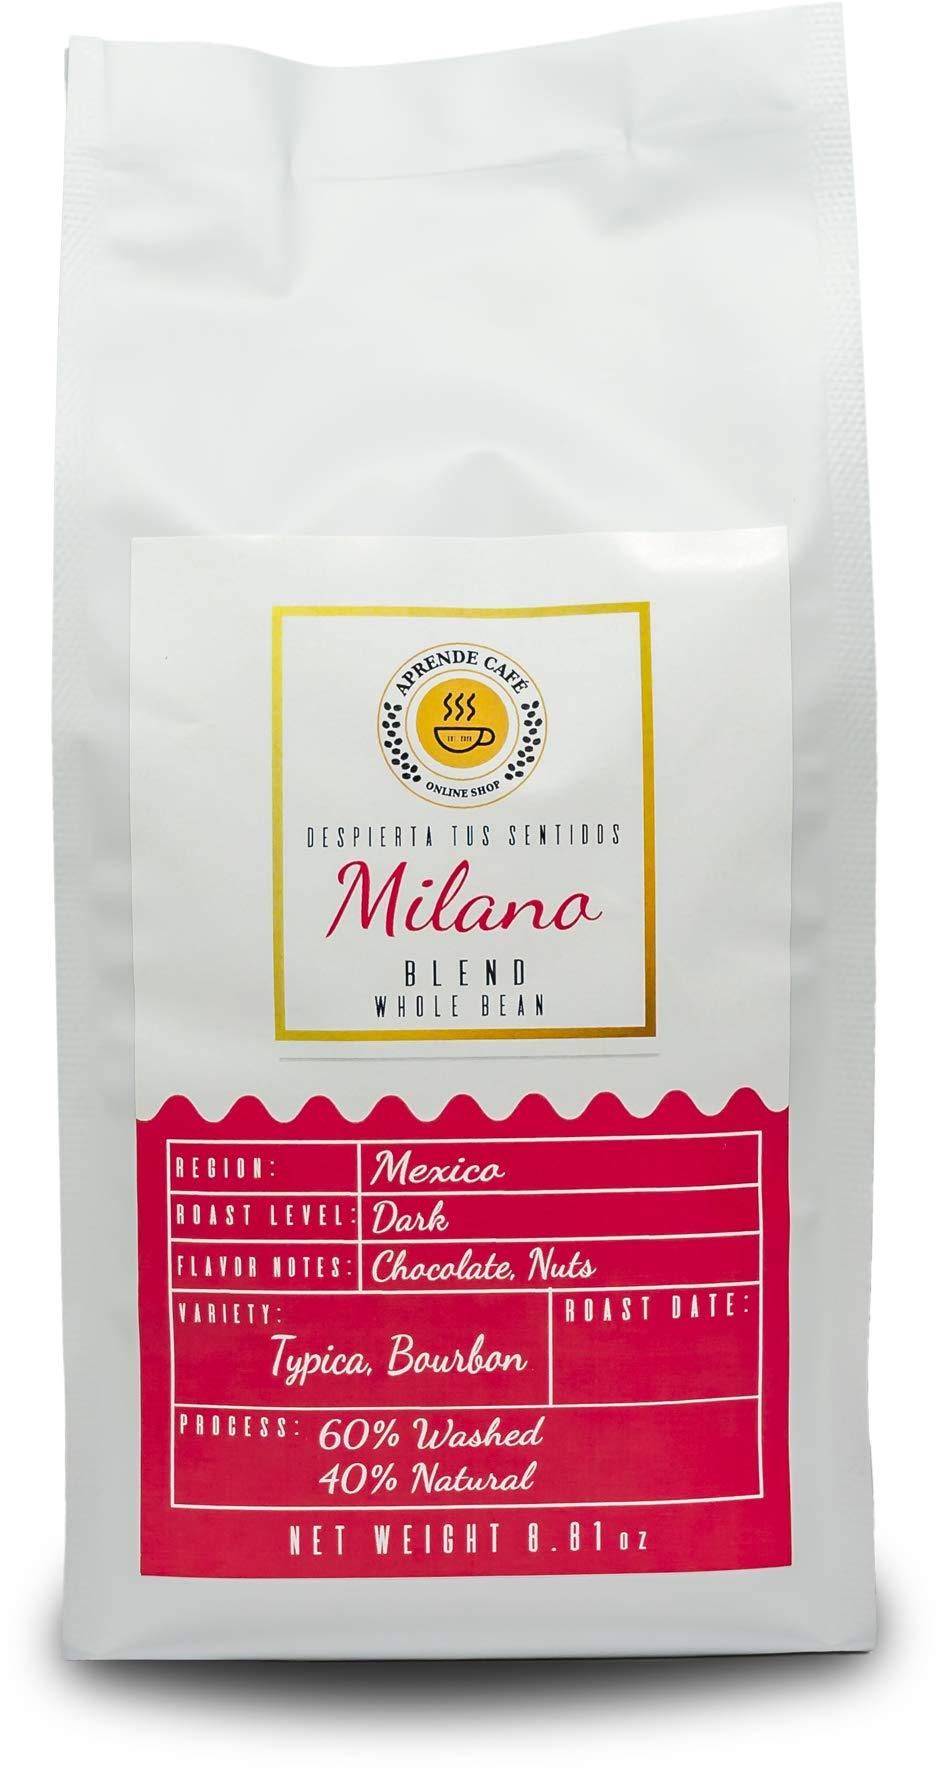 Milano 60% Washed, 40% Natural Process. Blend. Whole Beans. Aprende cafe. (8.81 oz)